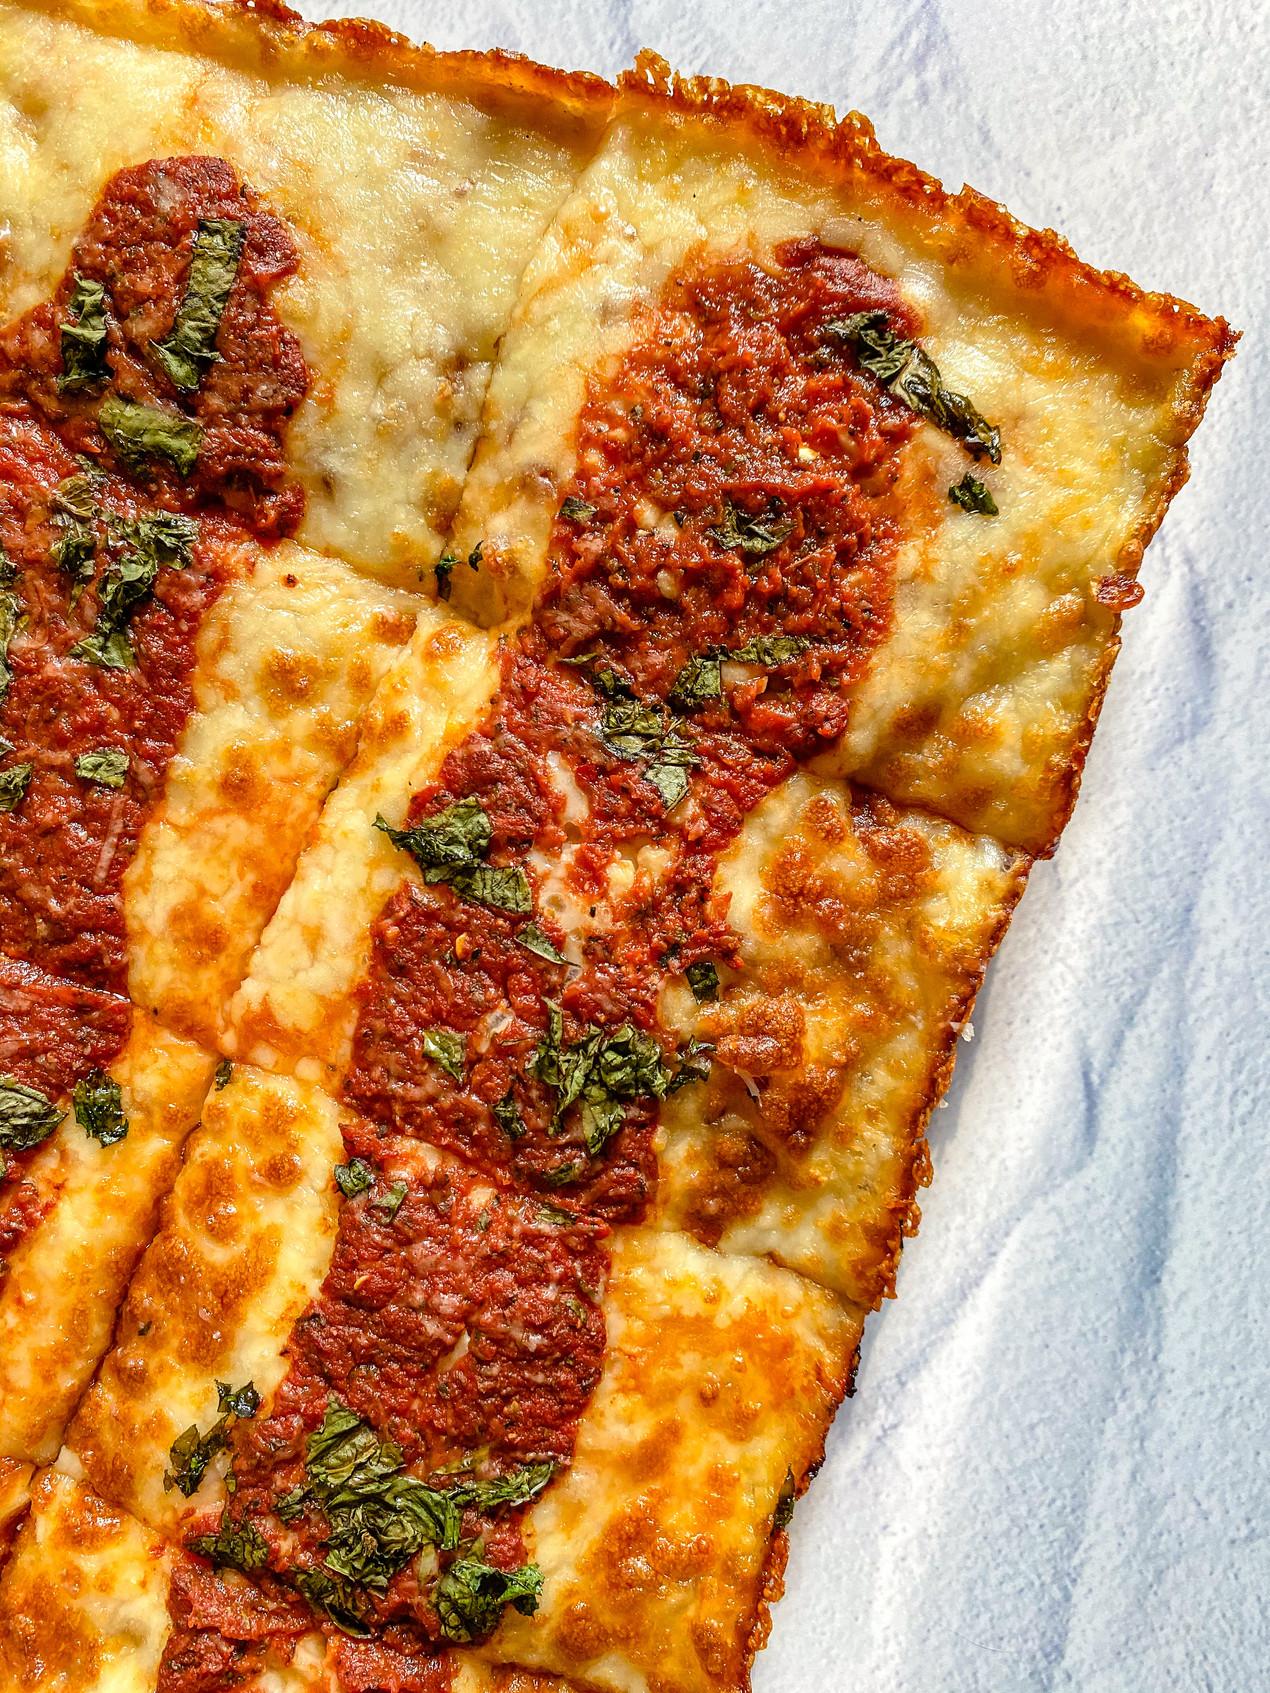 close up pizza with marinara sauce and cheese